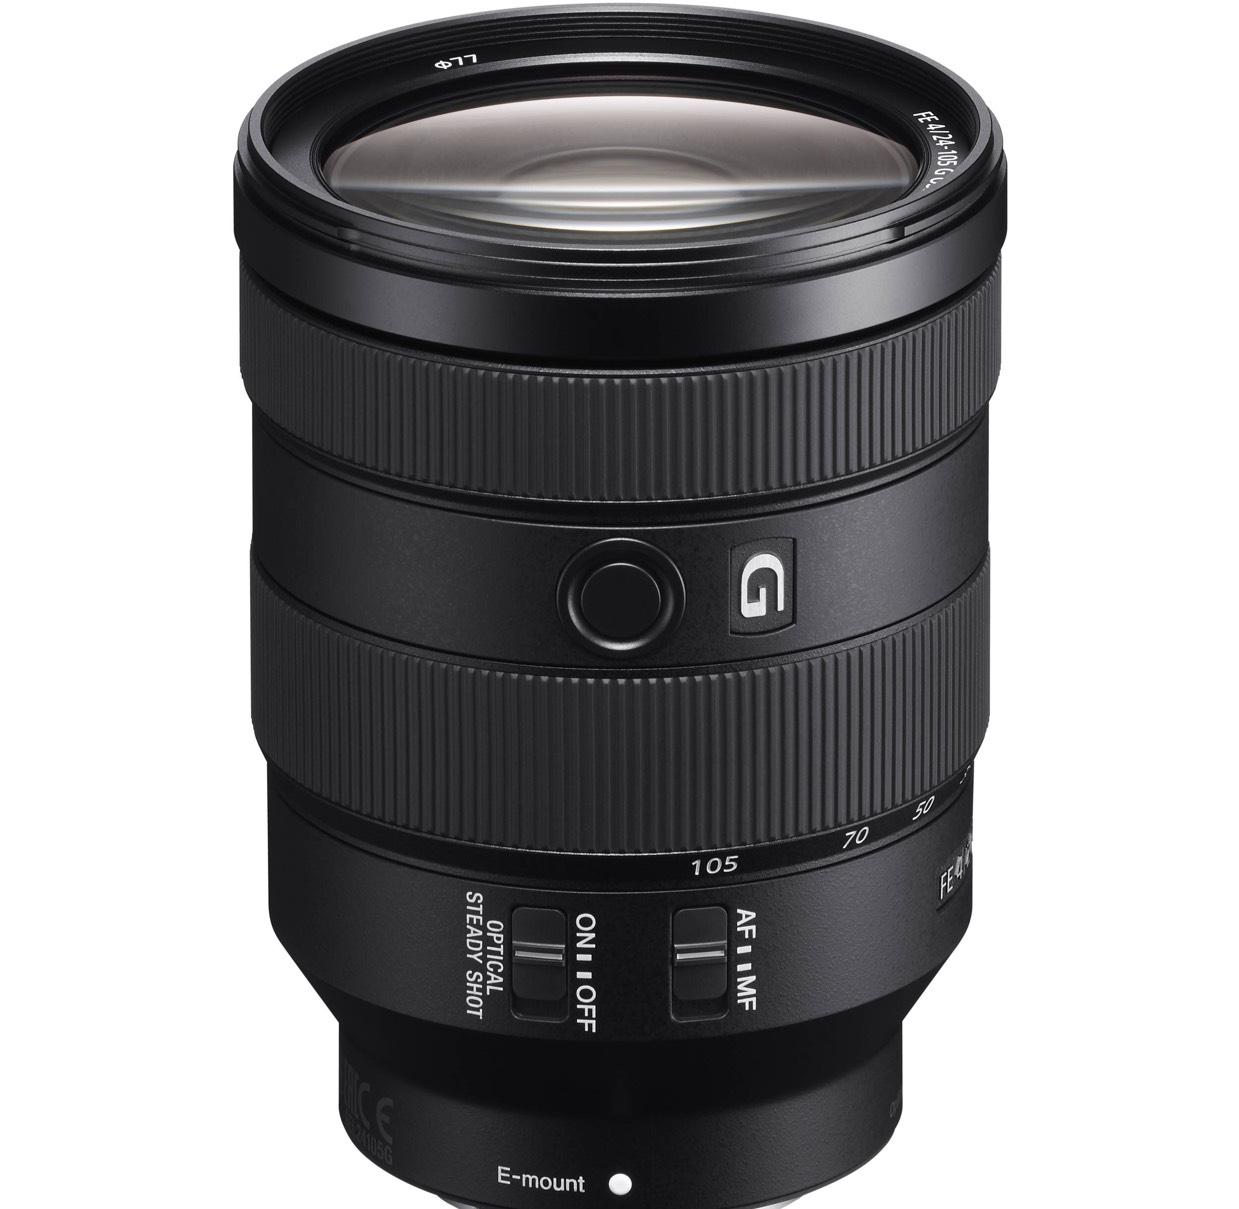 Sony FE 24-105mm f4 G OSS (SEL24105G) Amazon.de -im Zulauf-